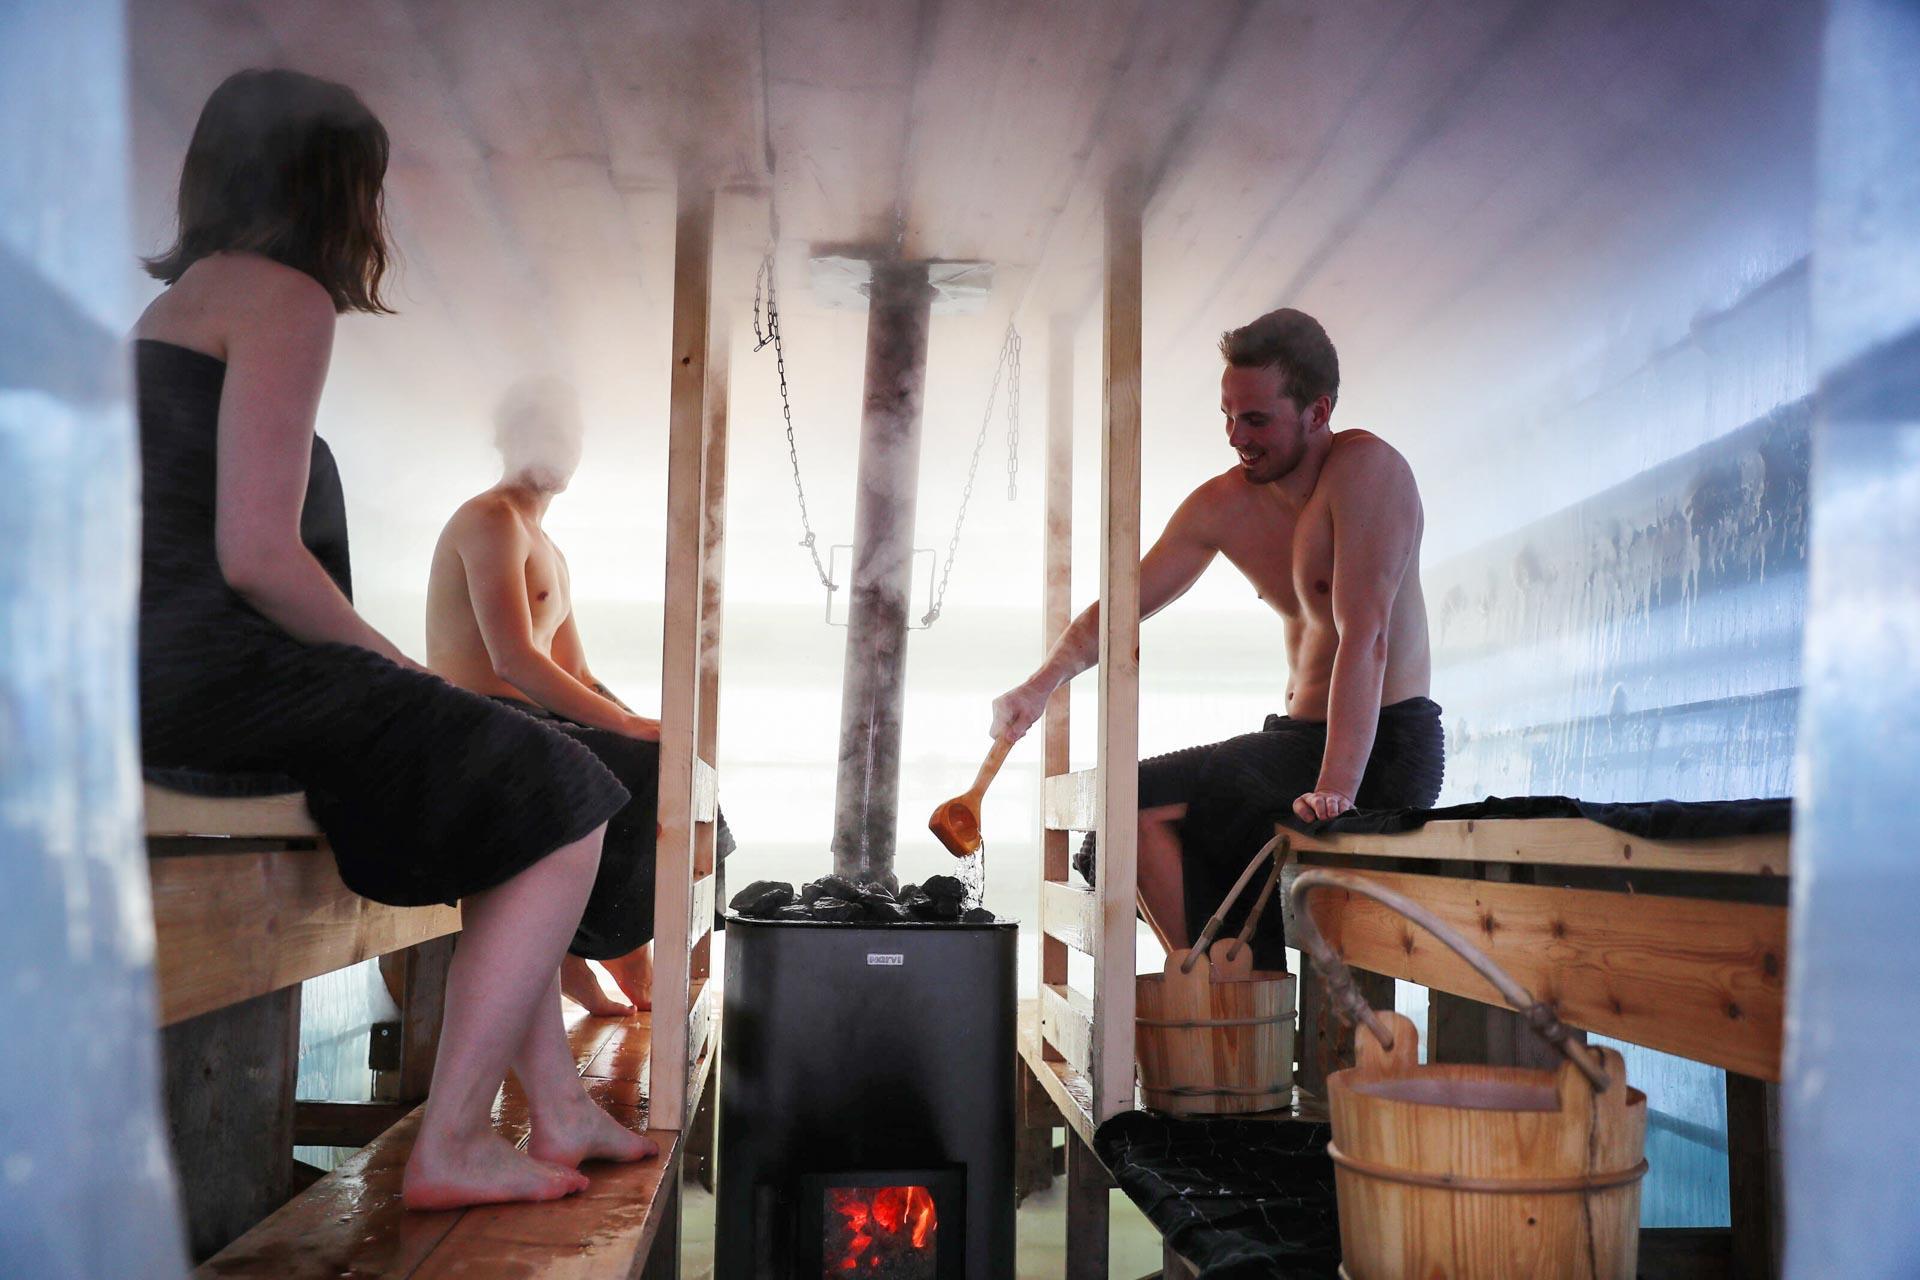 Un sauna construit en glace ? C'est possible ! © Harri Tarvainen - VisitFinland